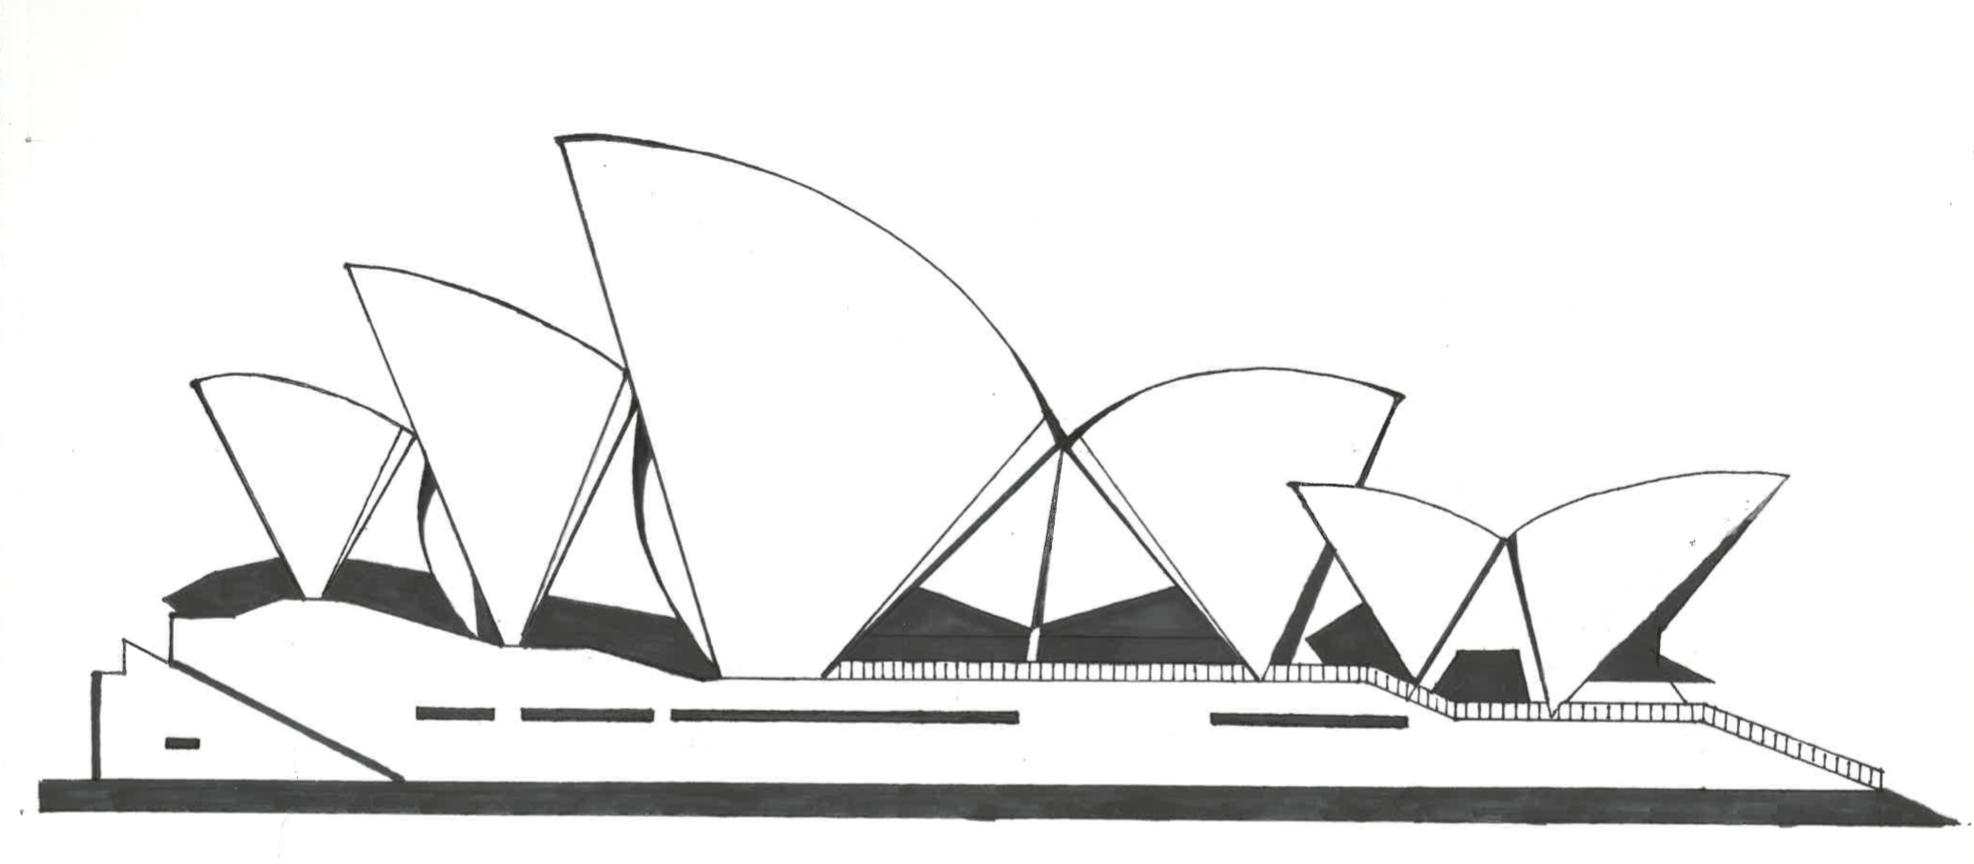 Sydney Flavours